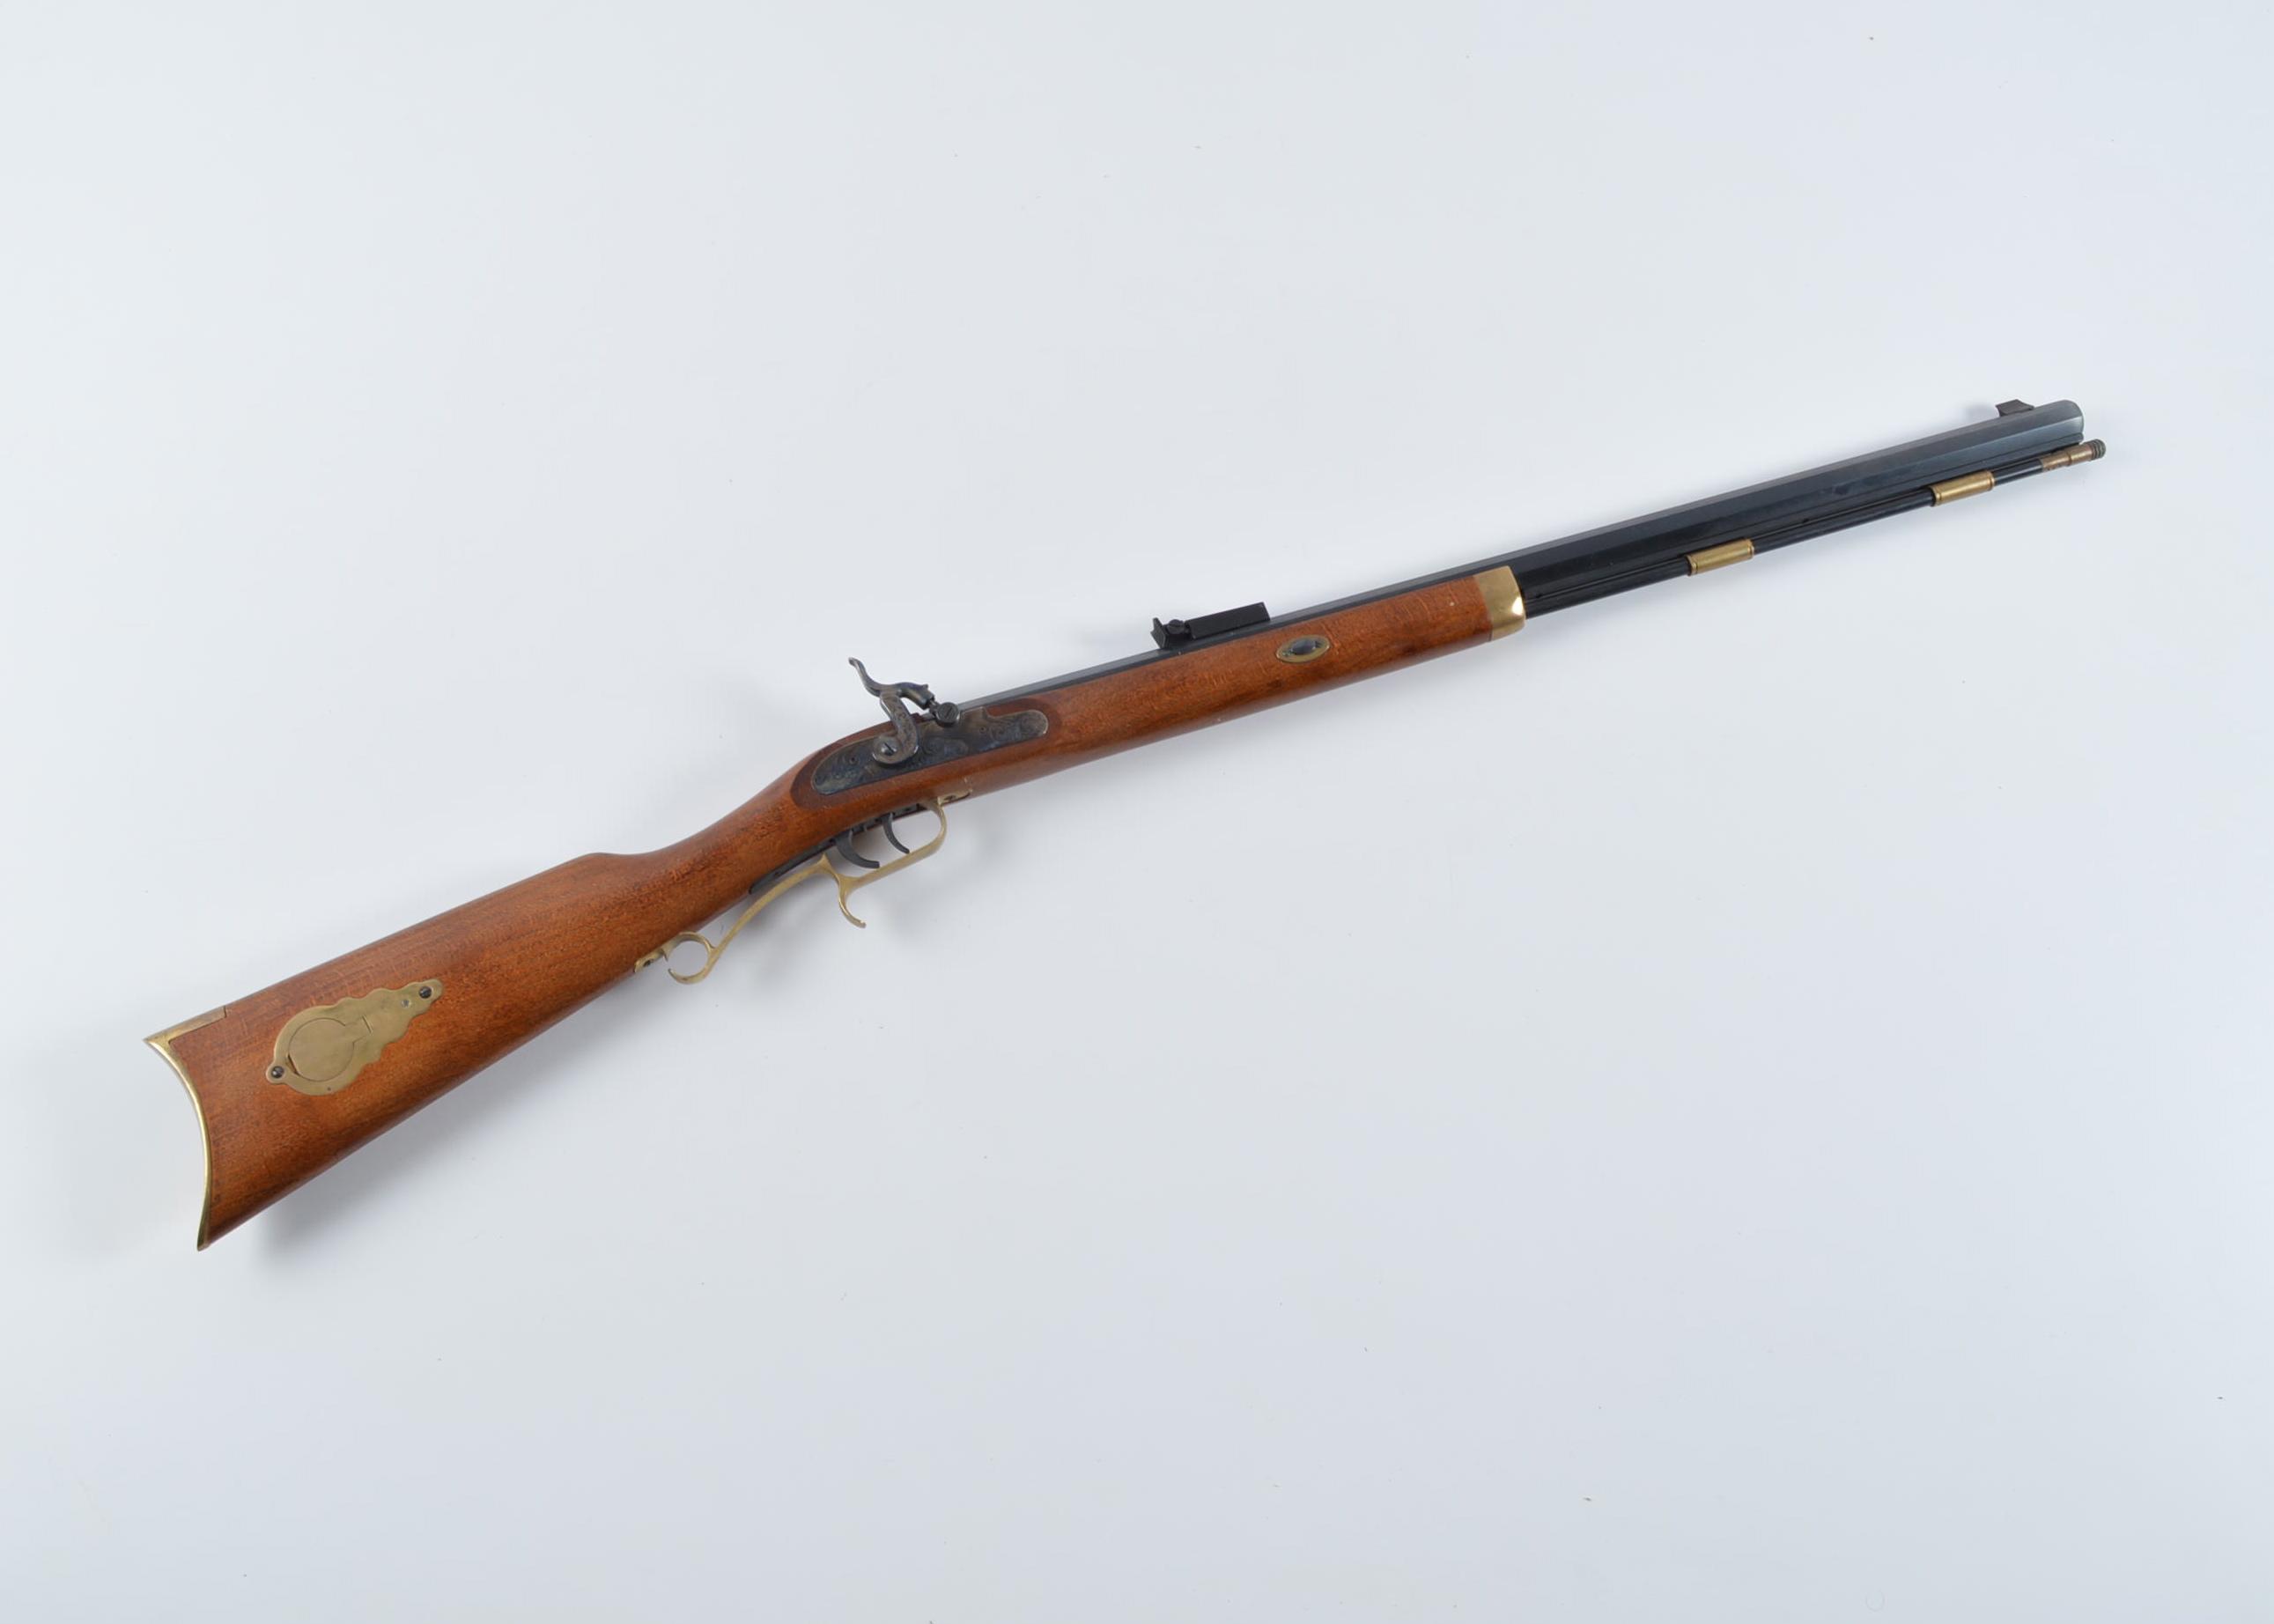 Harrington and richardson 410 shotgun